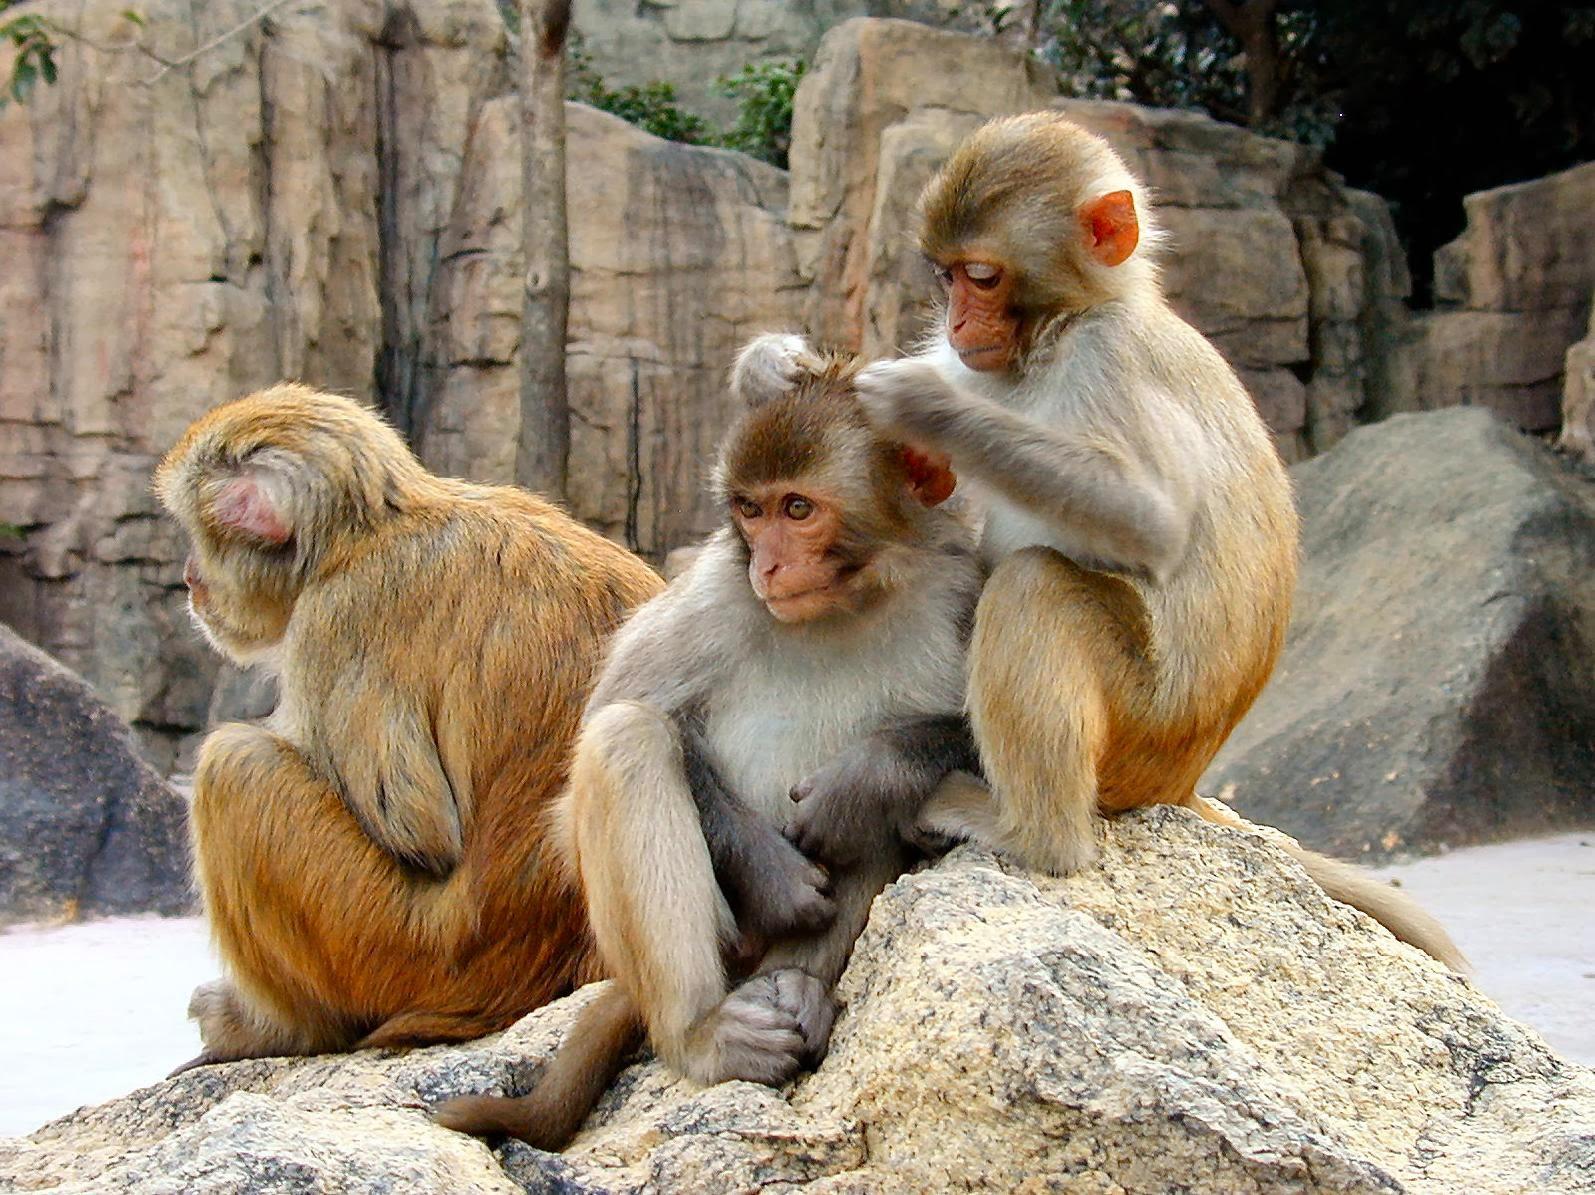 Three Monkeys Sitting Rock Wallpaper